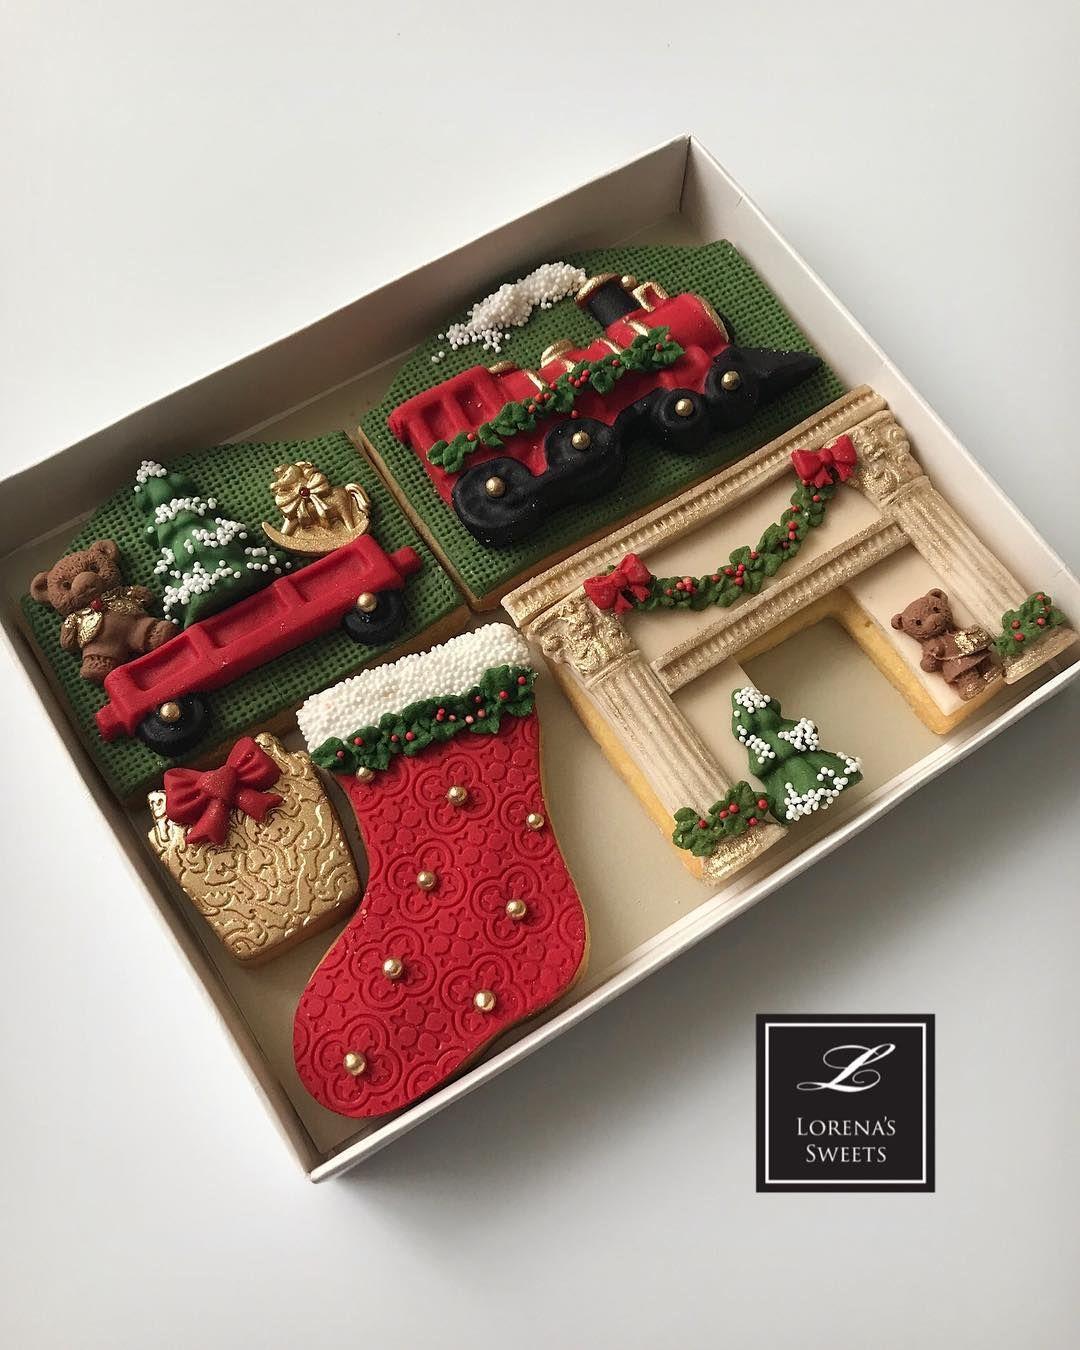 Lorenas Sweets Fondant Cookie Door//Christmas